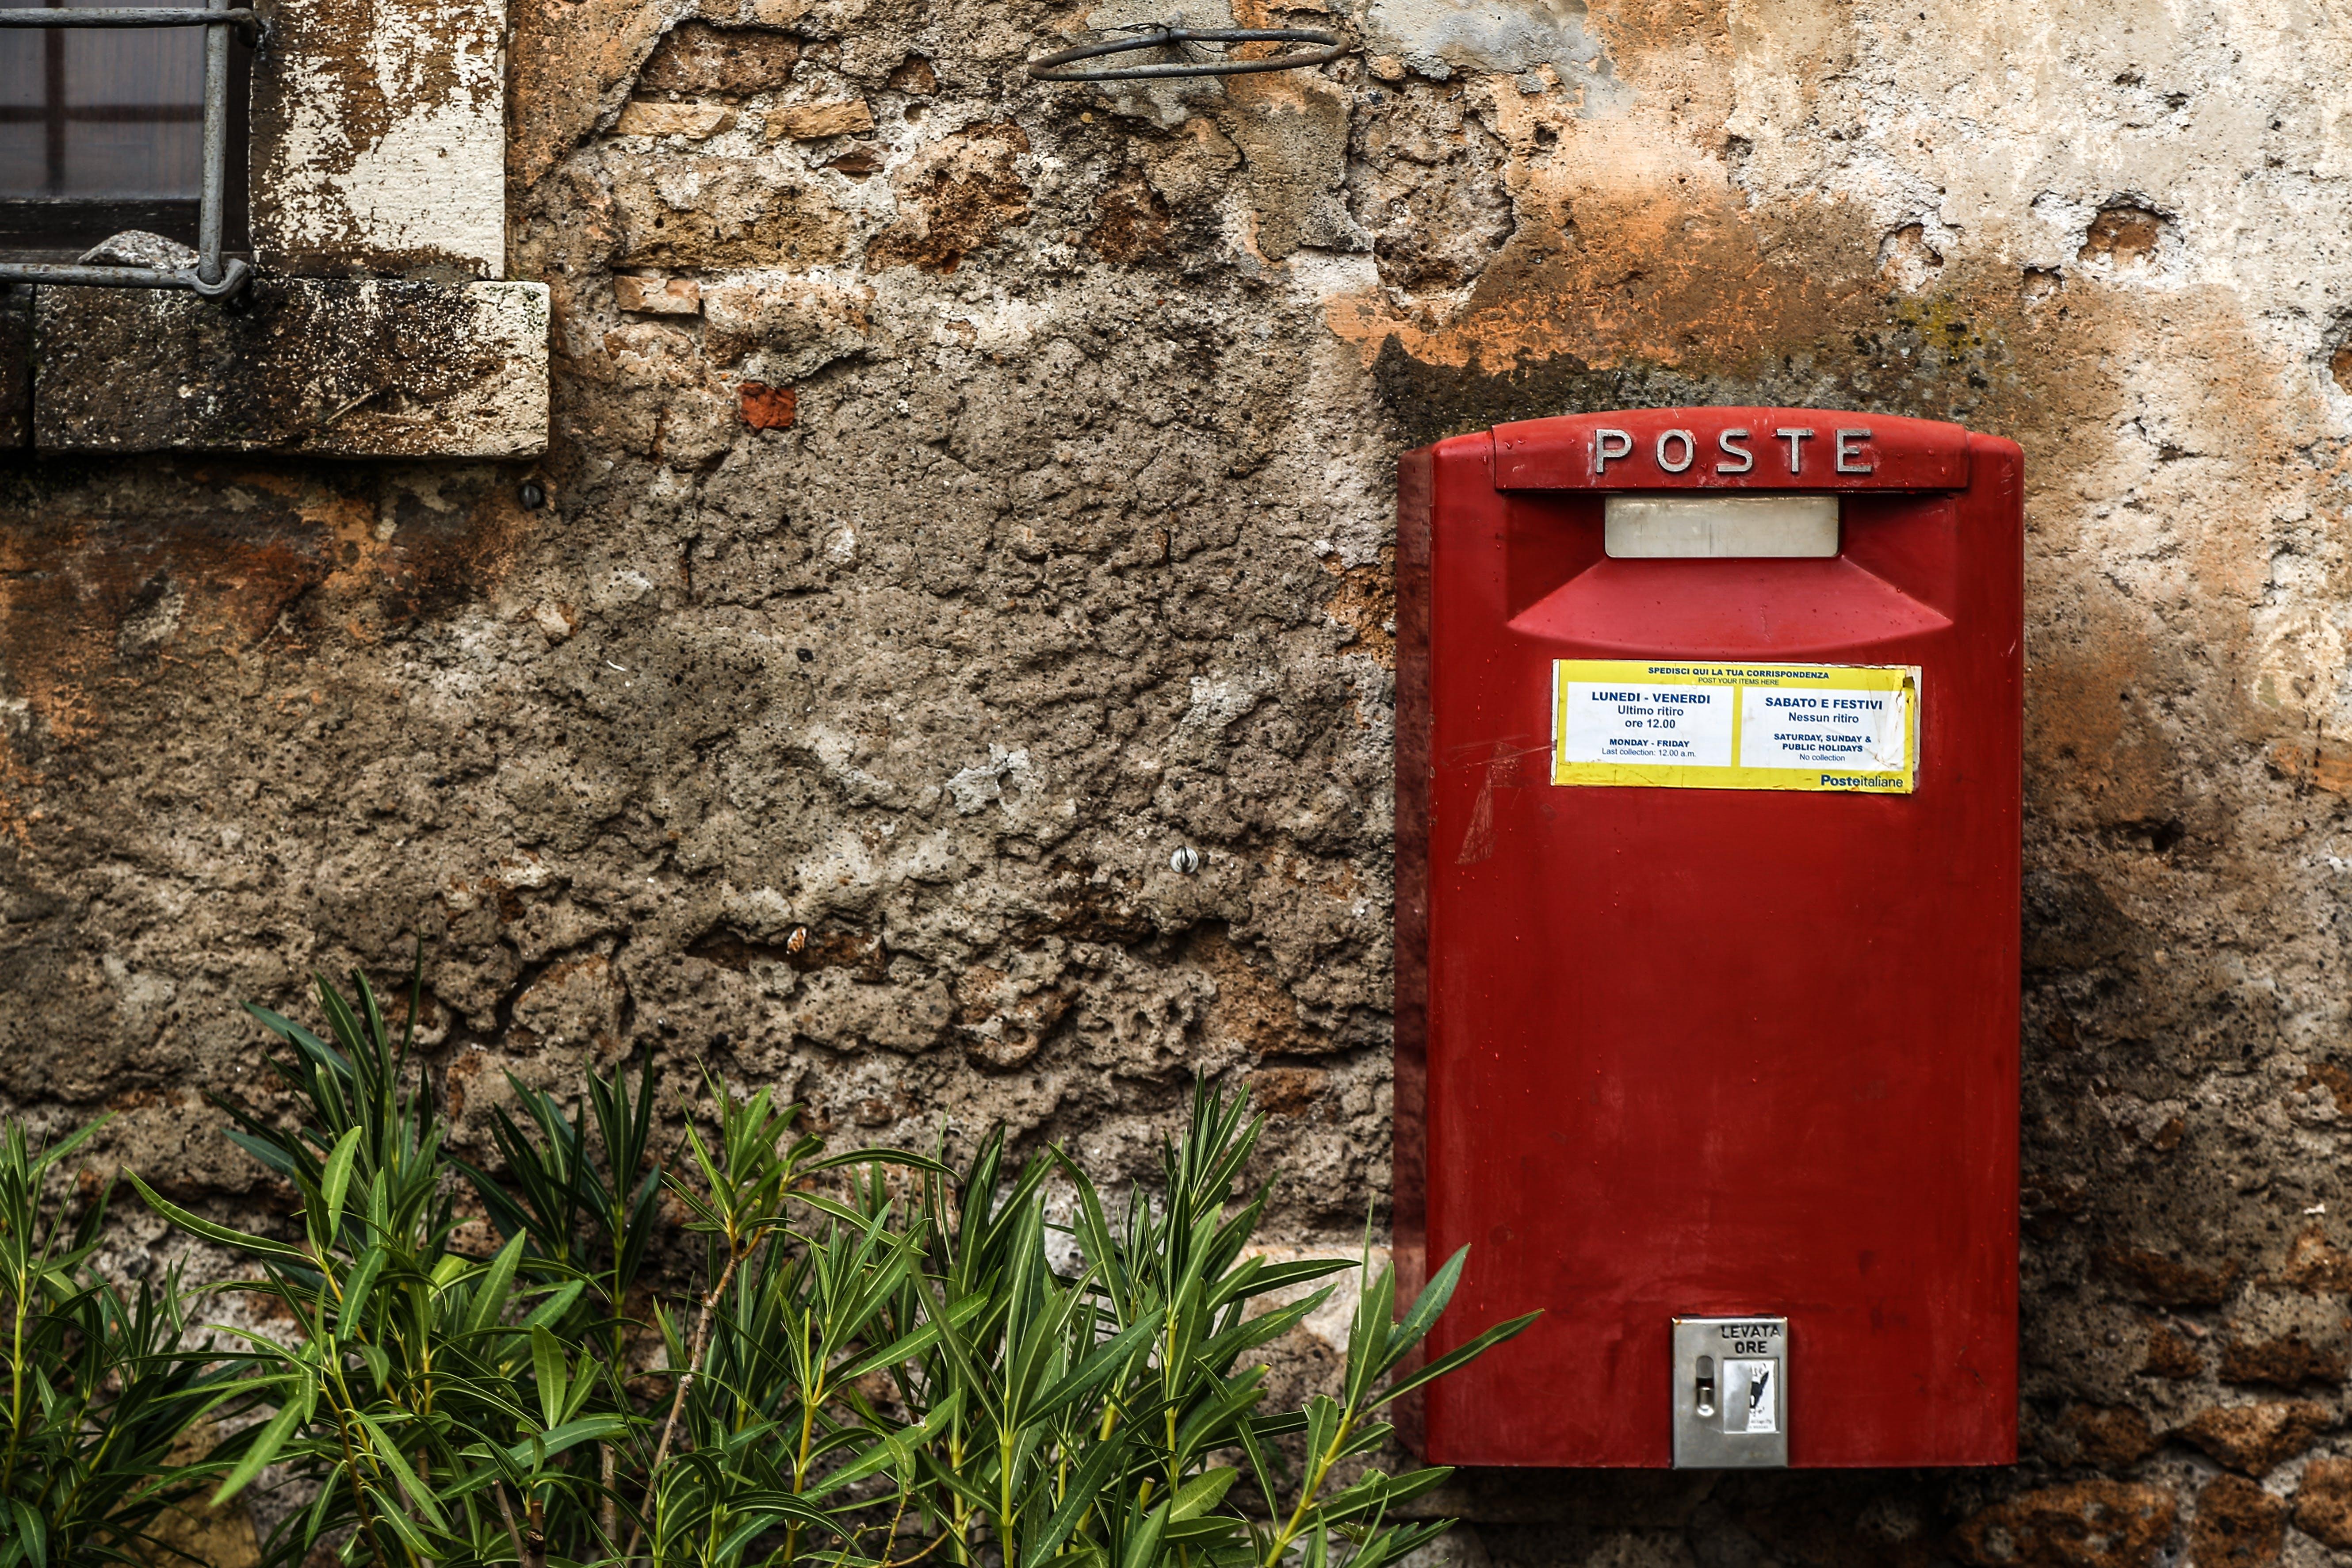 Red Mail Box Beside Green Grass